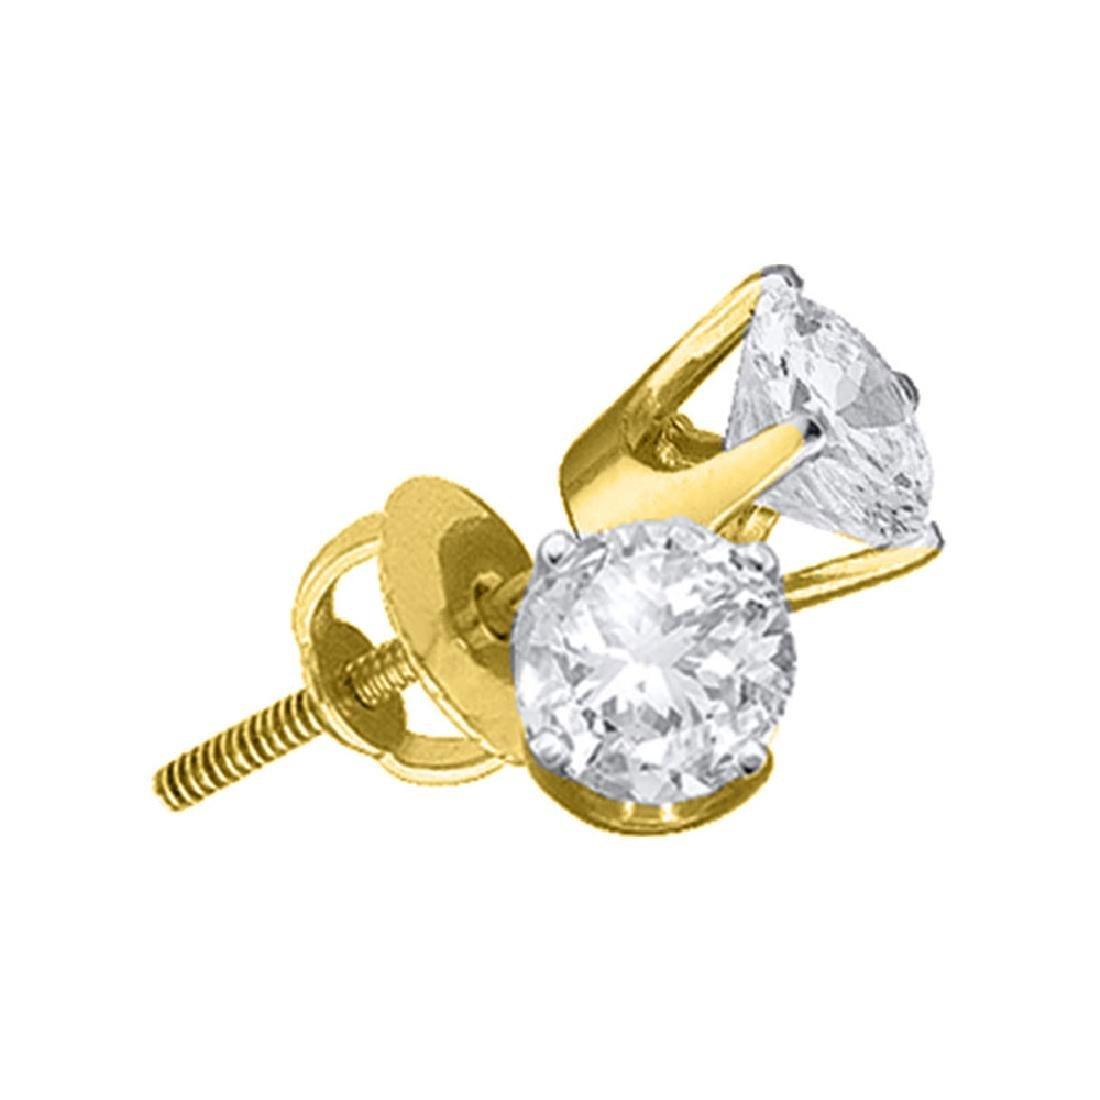 0.90 CTW Diamond Solitaire Stud Earrings 14KT Yellow